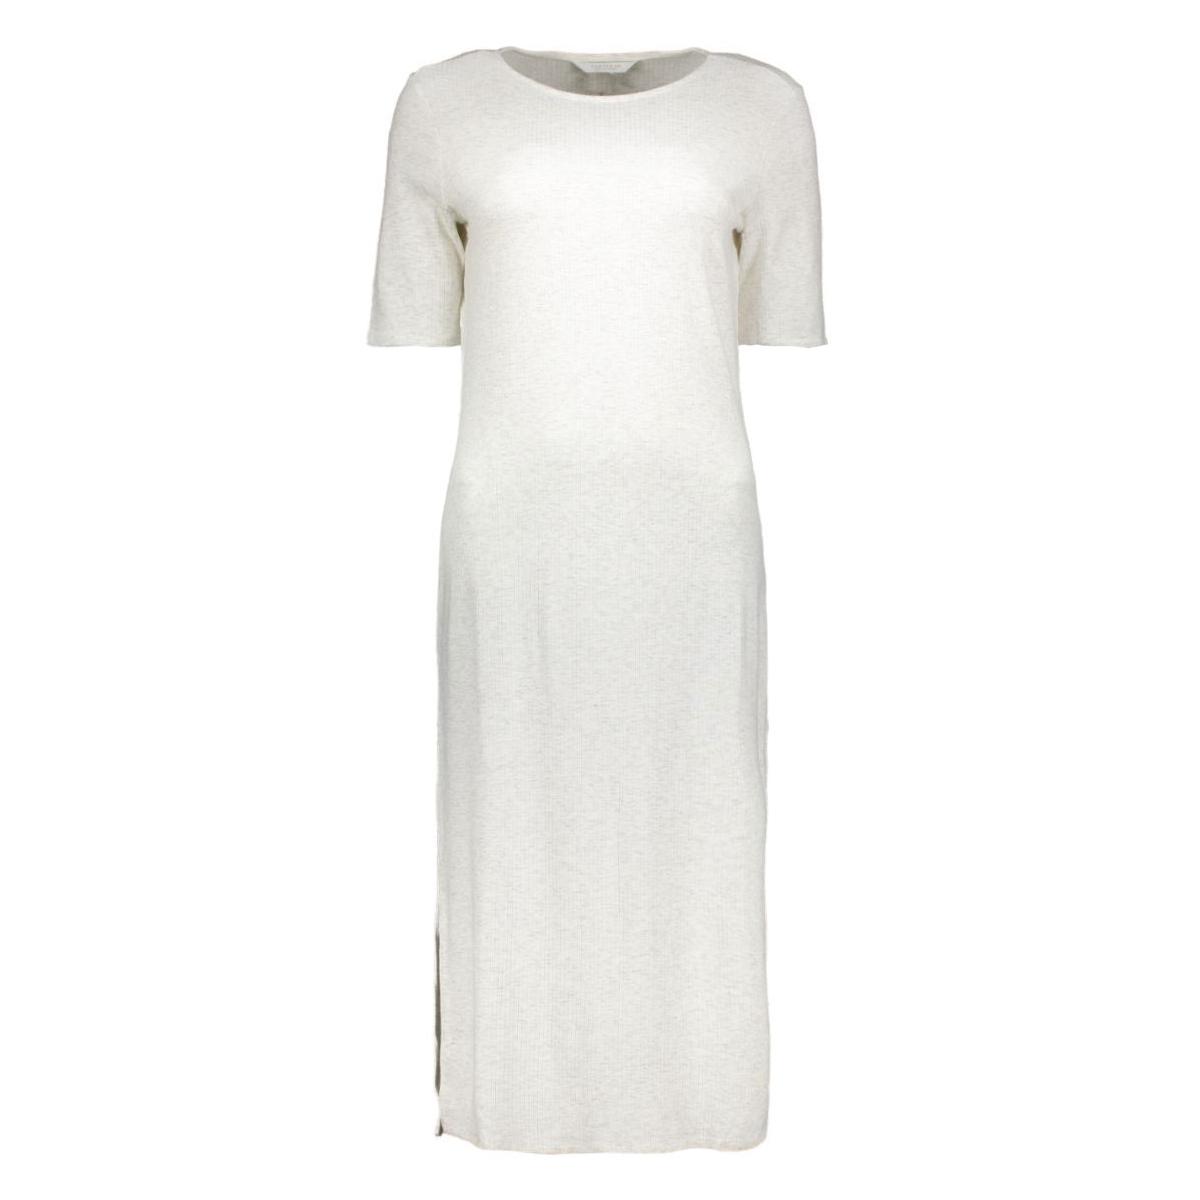 5019348.01.75 tom tailor jurk 8210